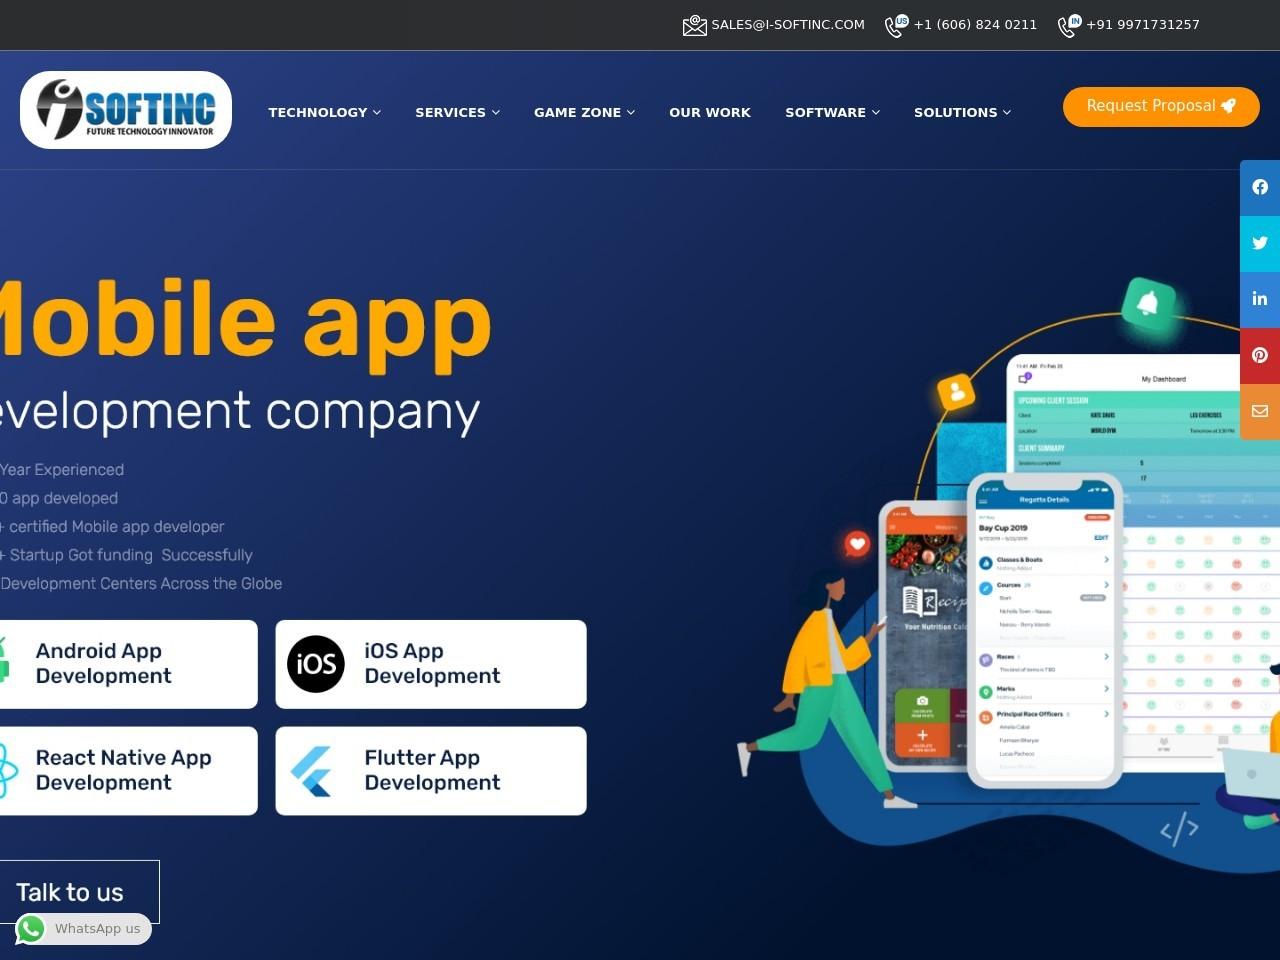 Android Development Services I-Softinc Noida